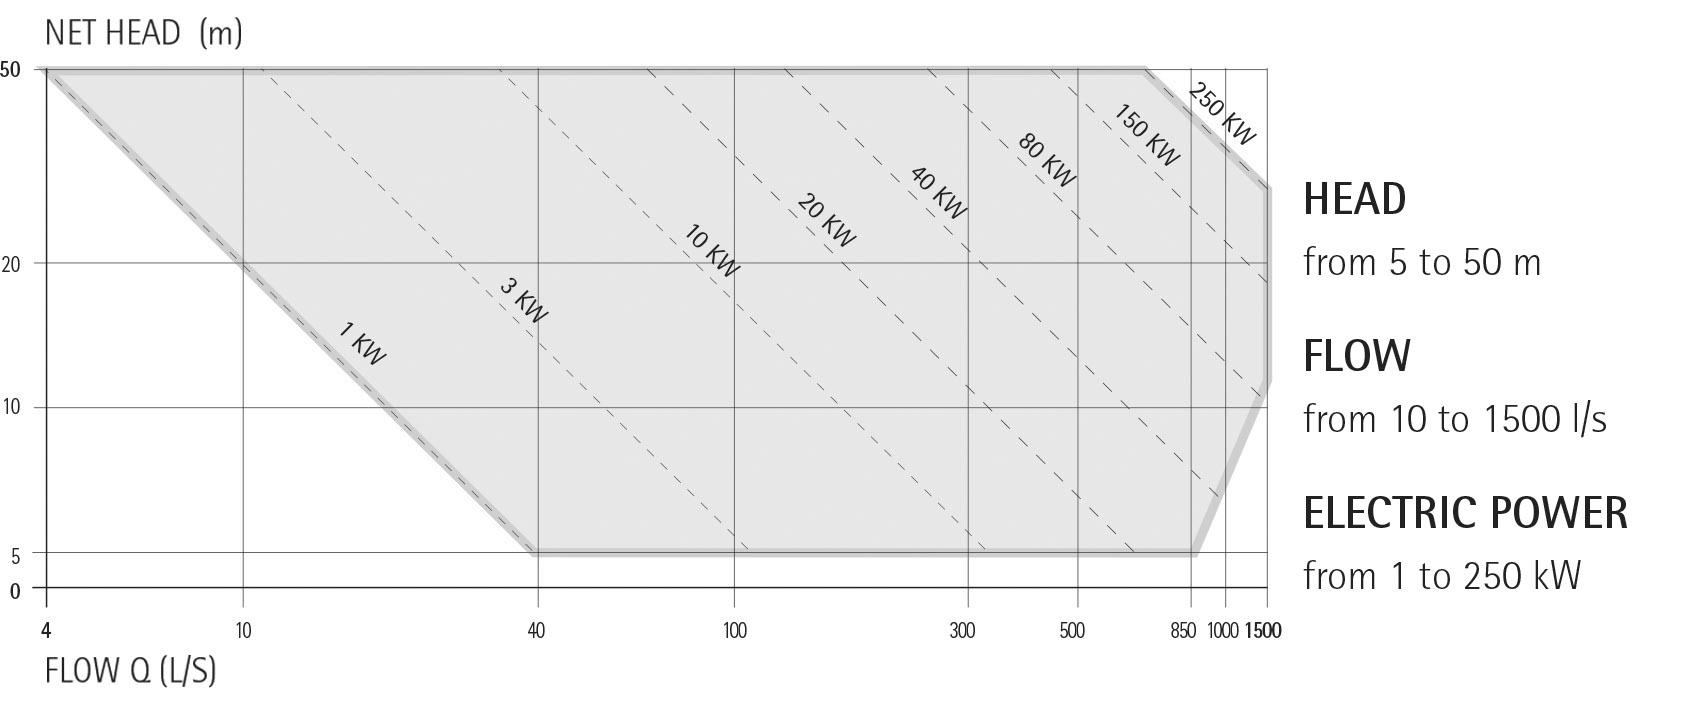 Banki Turbines Hydro Irem Power Quality Turbine Idroelettriche Hydroelectric Diagram Ecowatt Chart